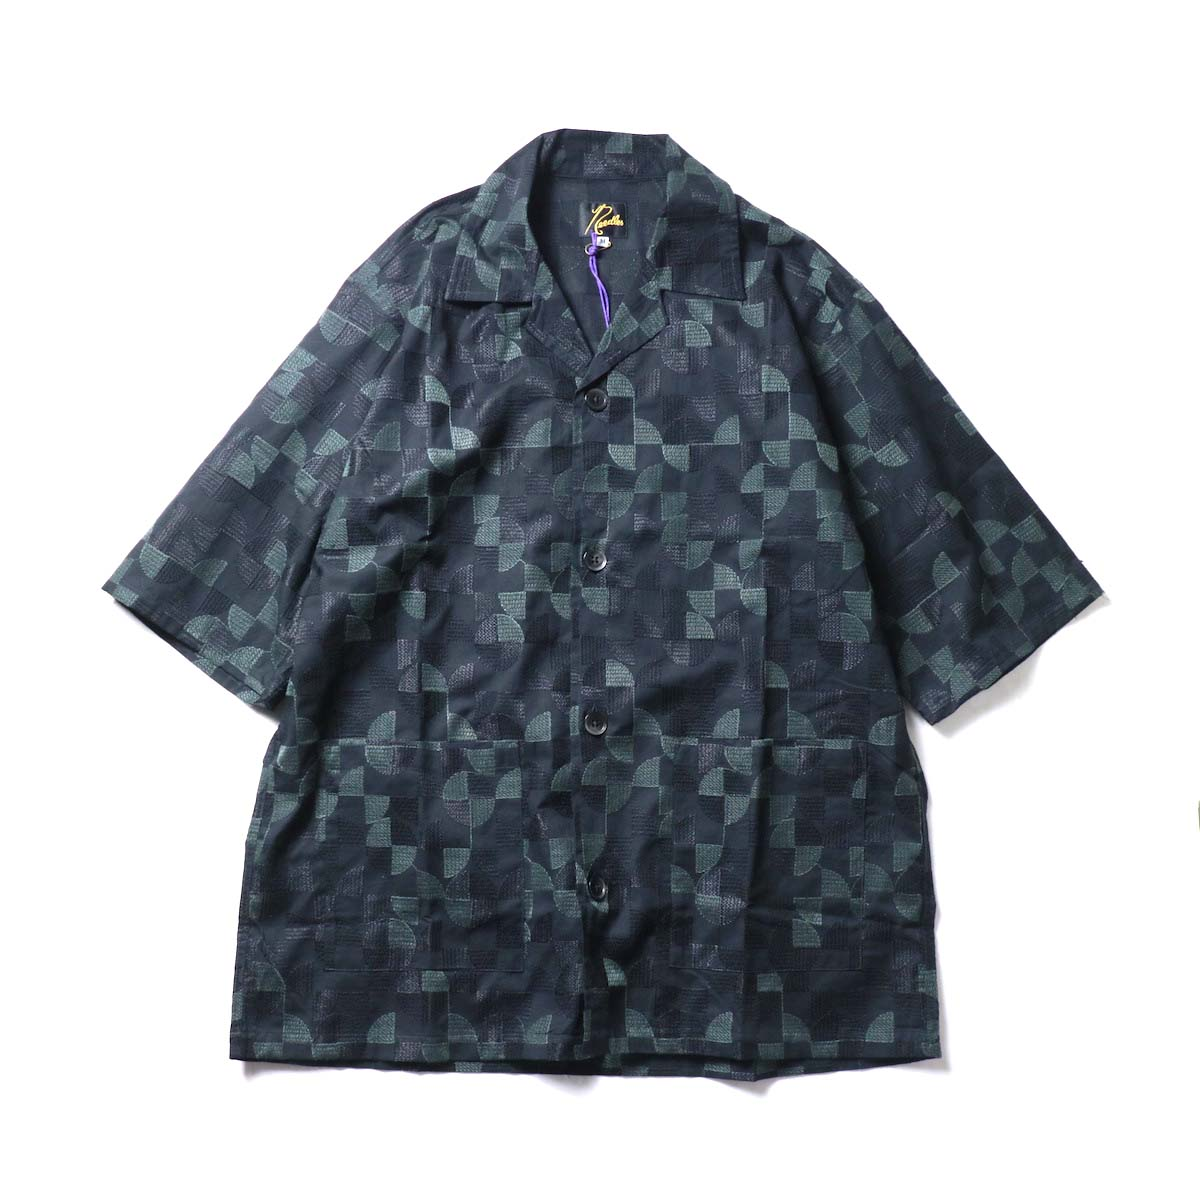 Needles / Cabana Shirt  - Circle Emb. (Black)